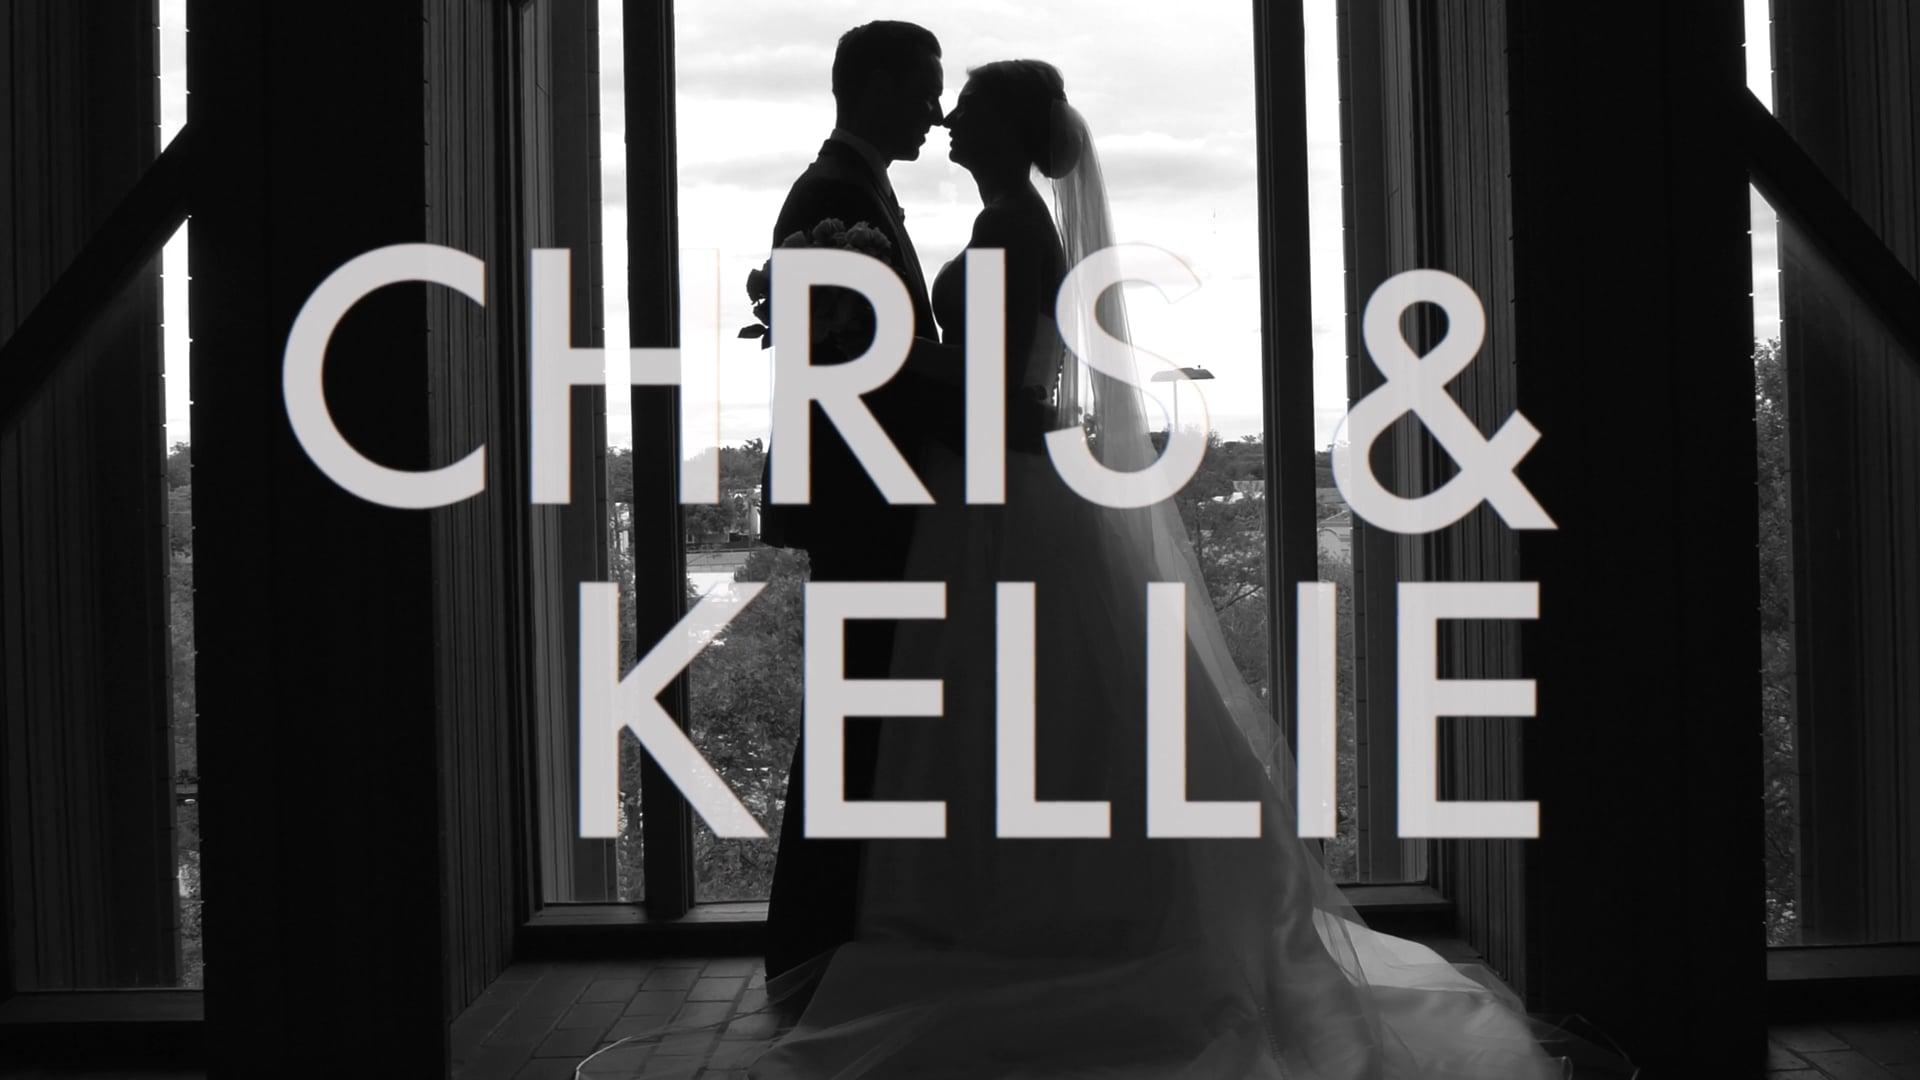 Kellie & Chris Highlight 4K